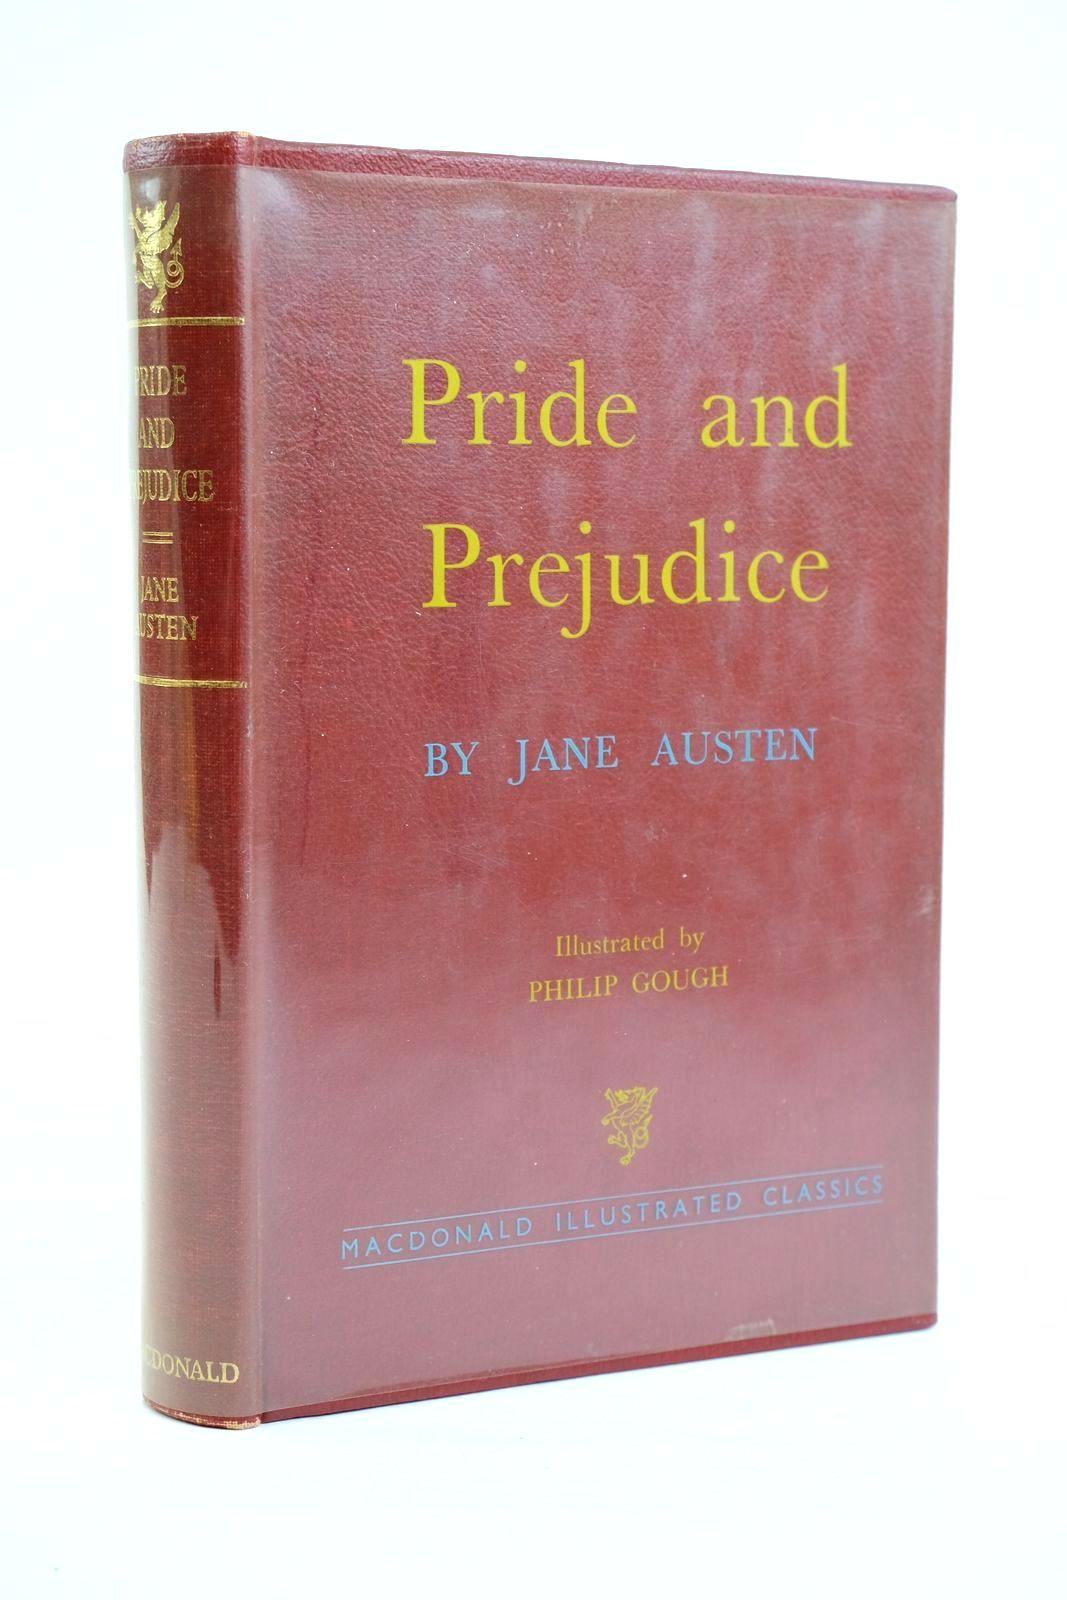 Photo of PRIDE AND PREJUDICE- Stock Number: 1320173